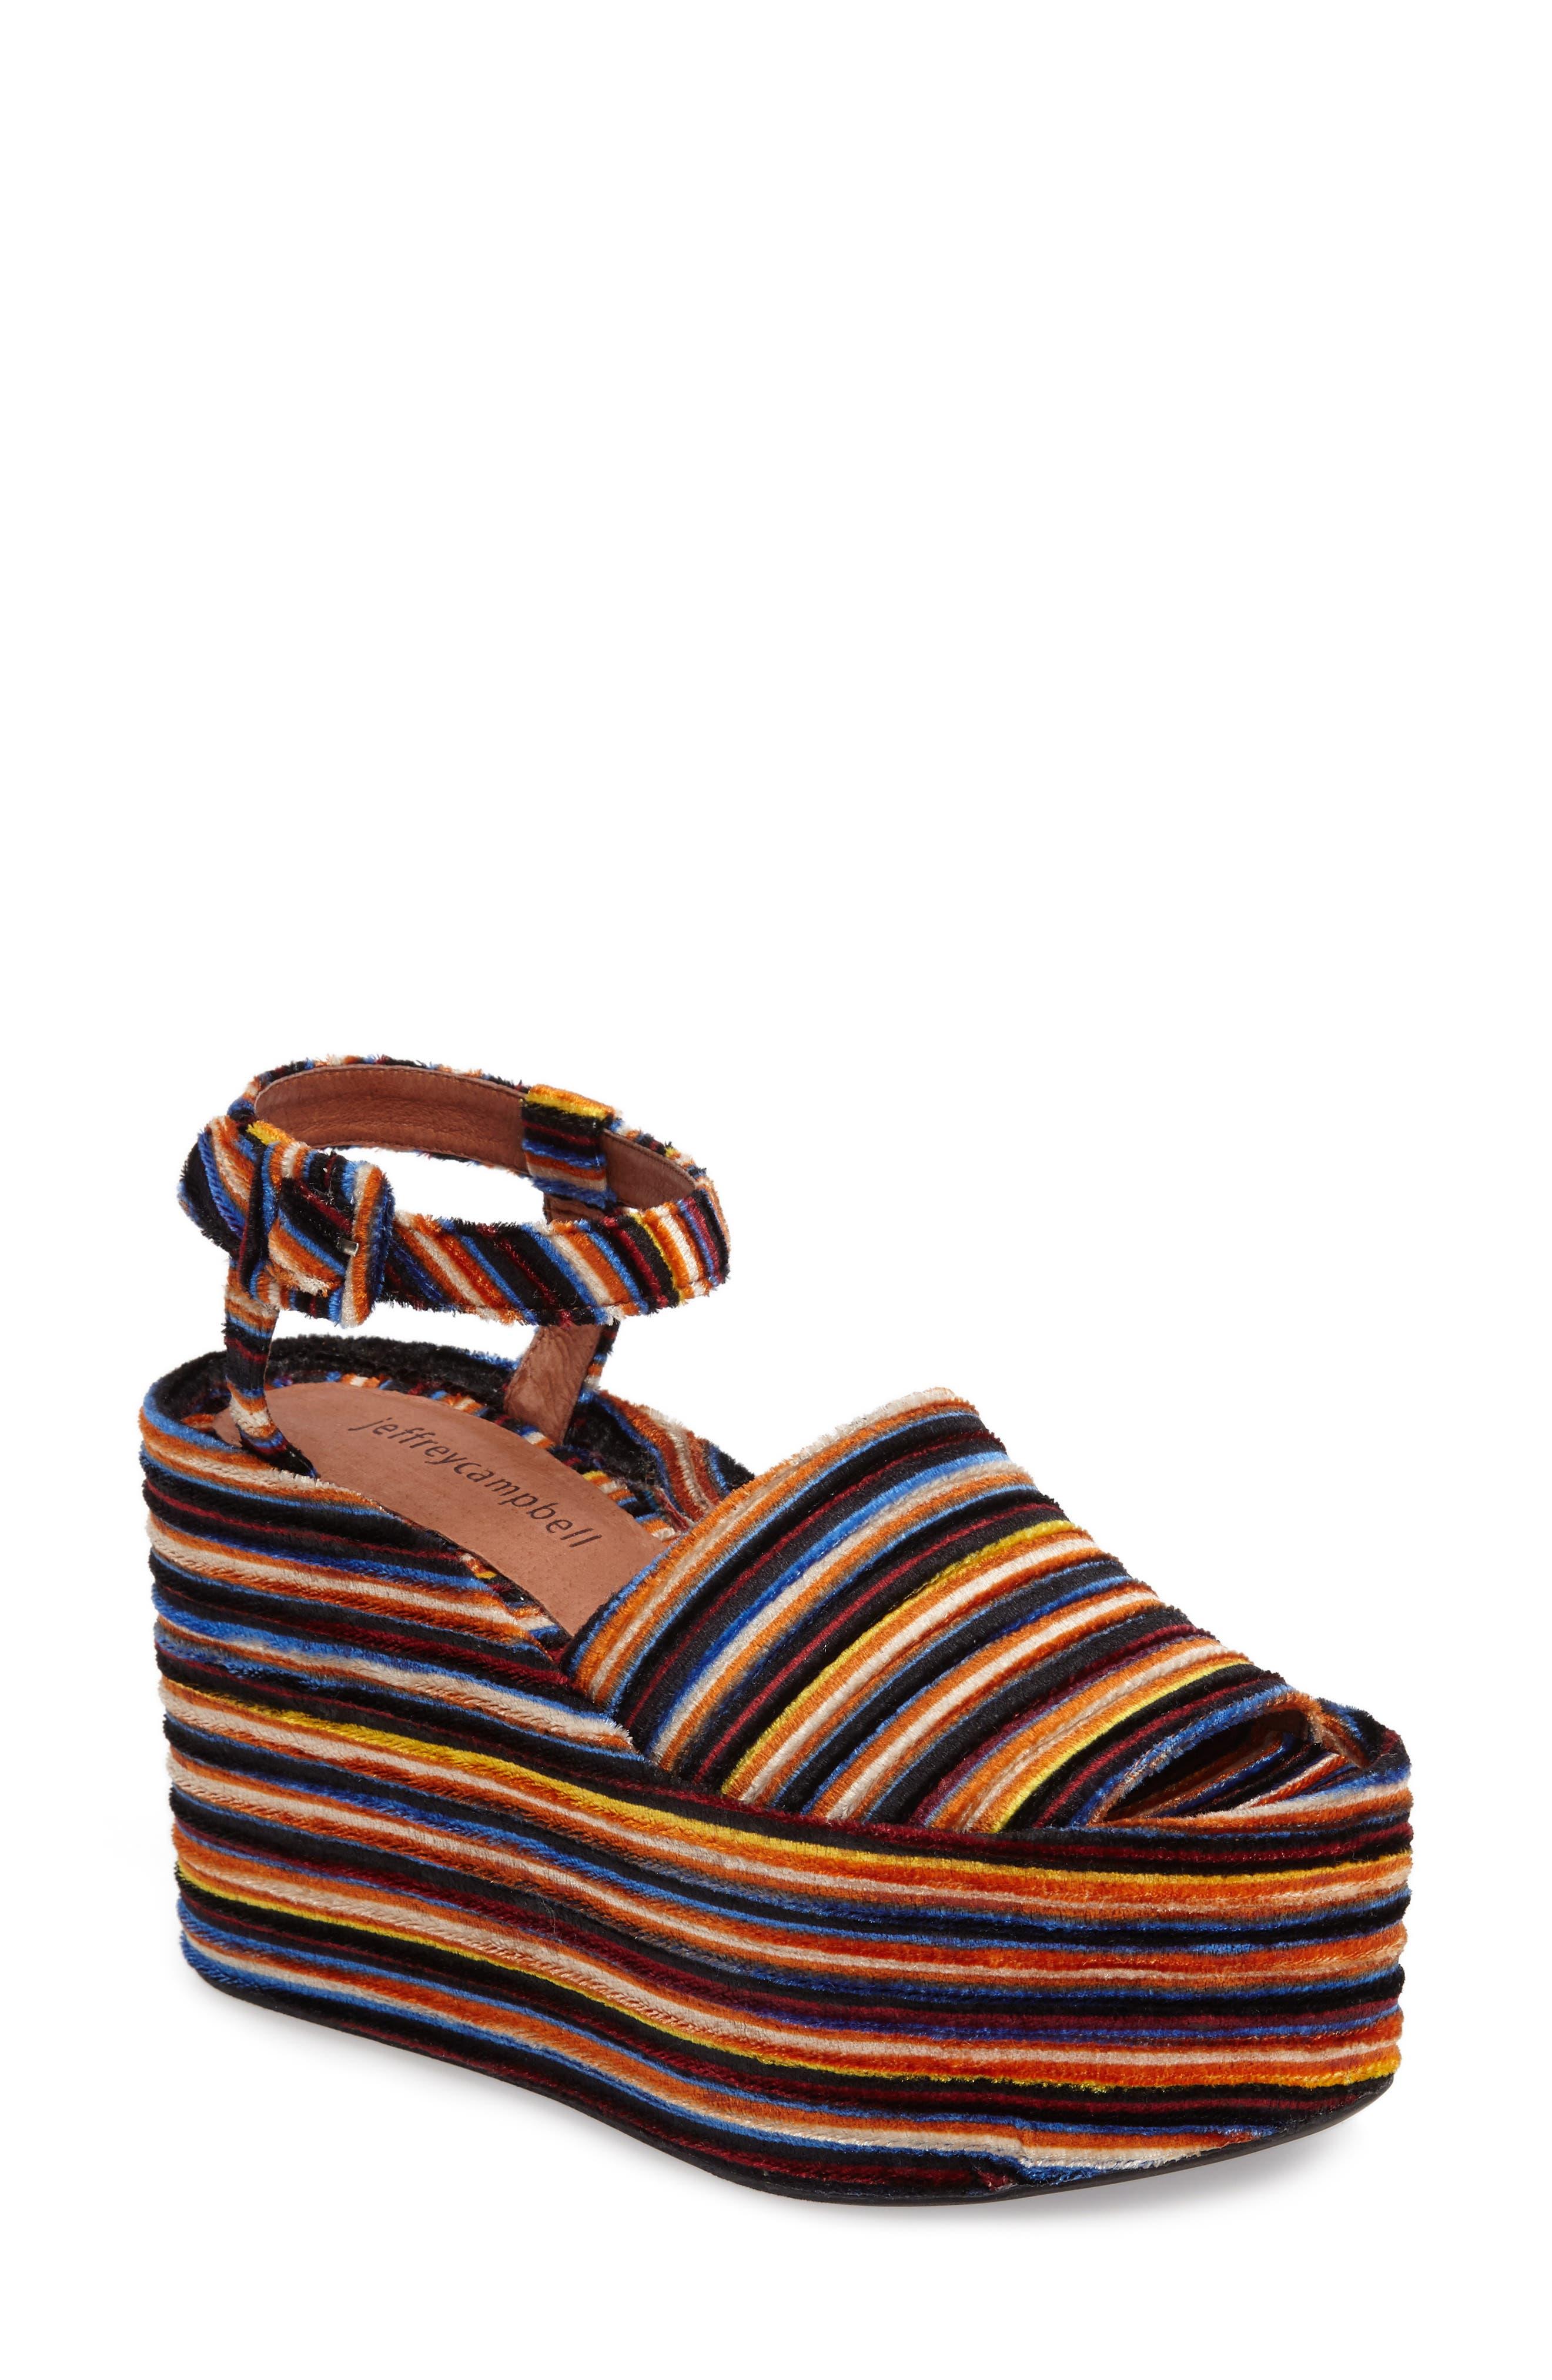 Alternate Image 1 Selected - Jeffrey Campbell Chynna Platform Sandal (Women)